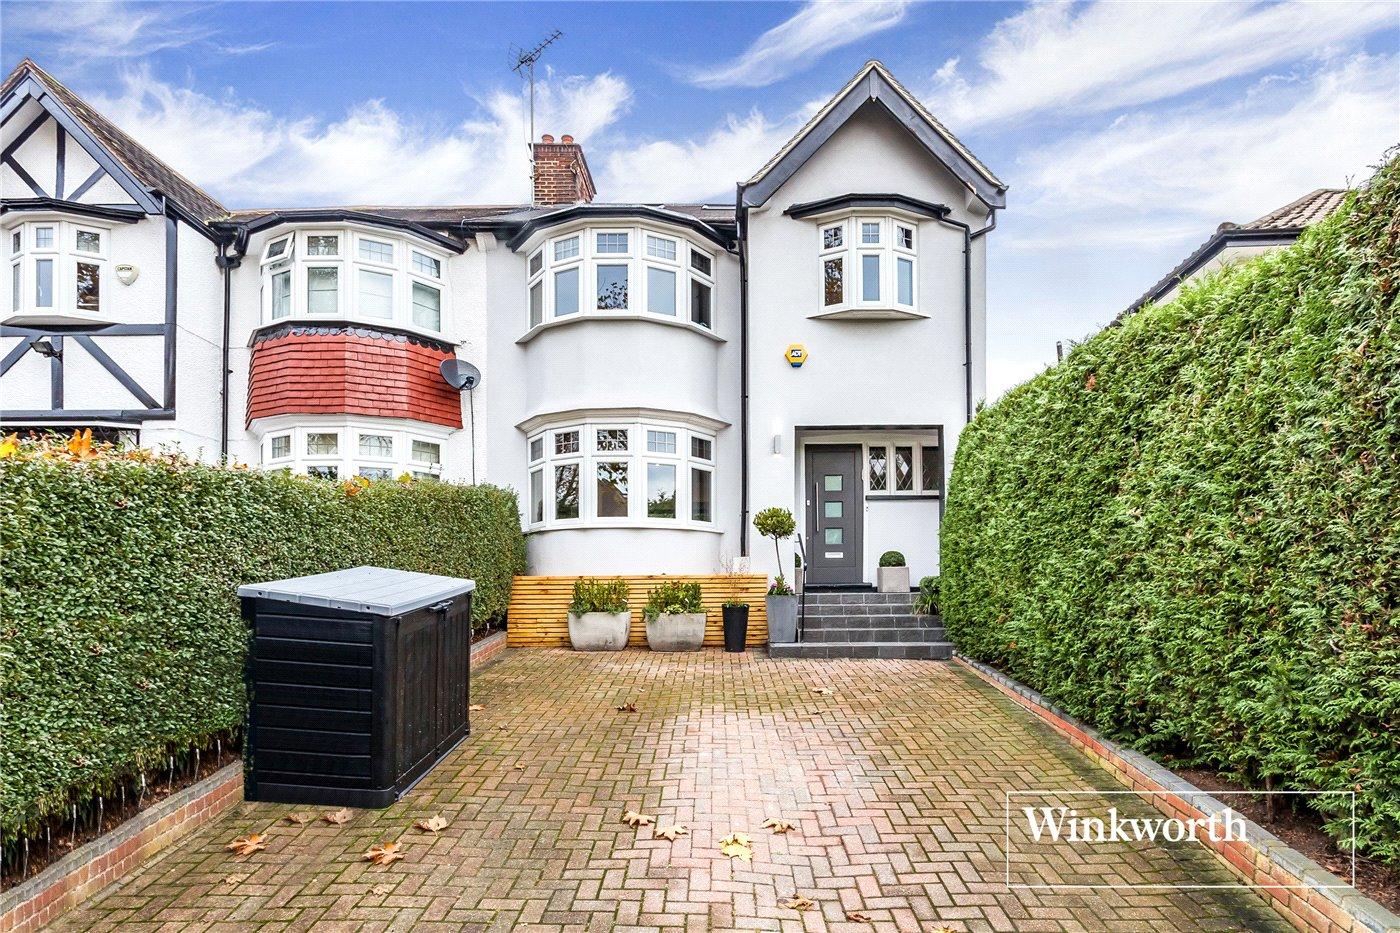 4 Bedrooms Semi Detached House for sale in Beechwood Avenue, Finchley, London, N3